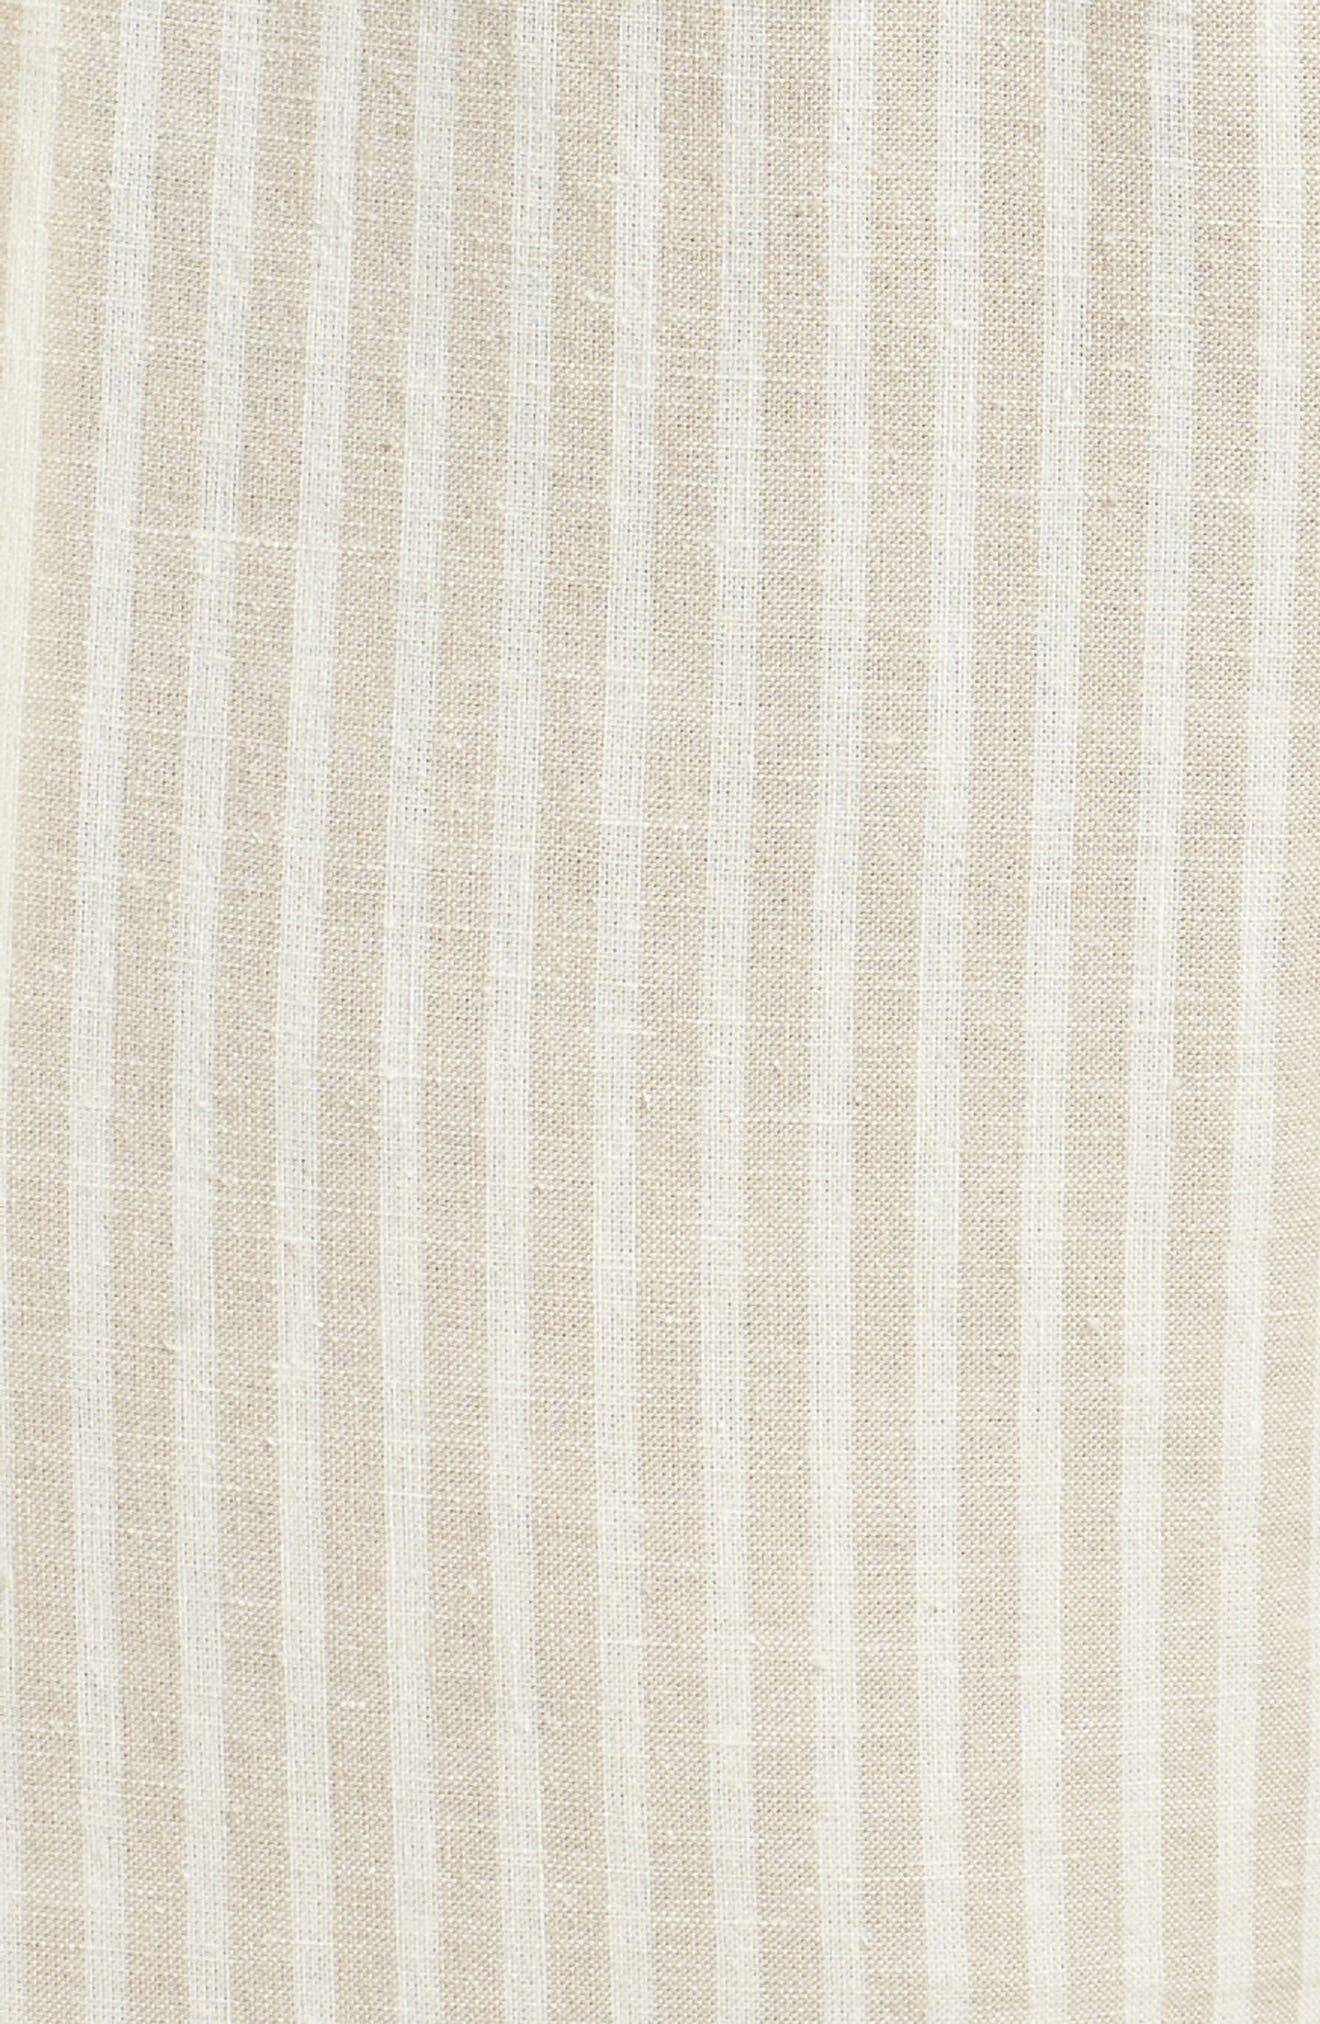 Stripe Ankle Hemp & Cotton Pants,                             Alternate thumbnail 6, color,                             257